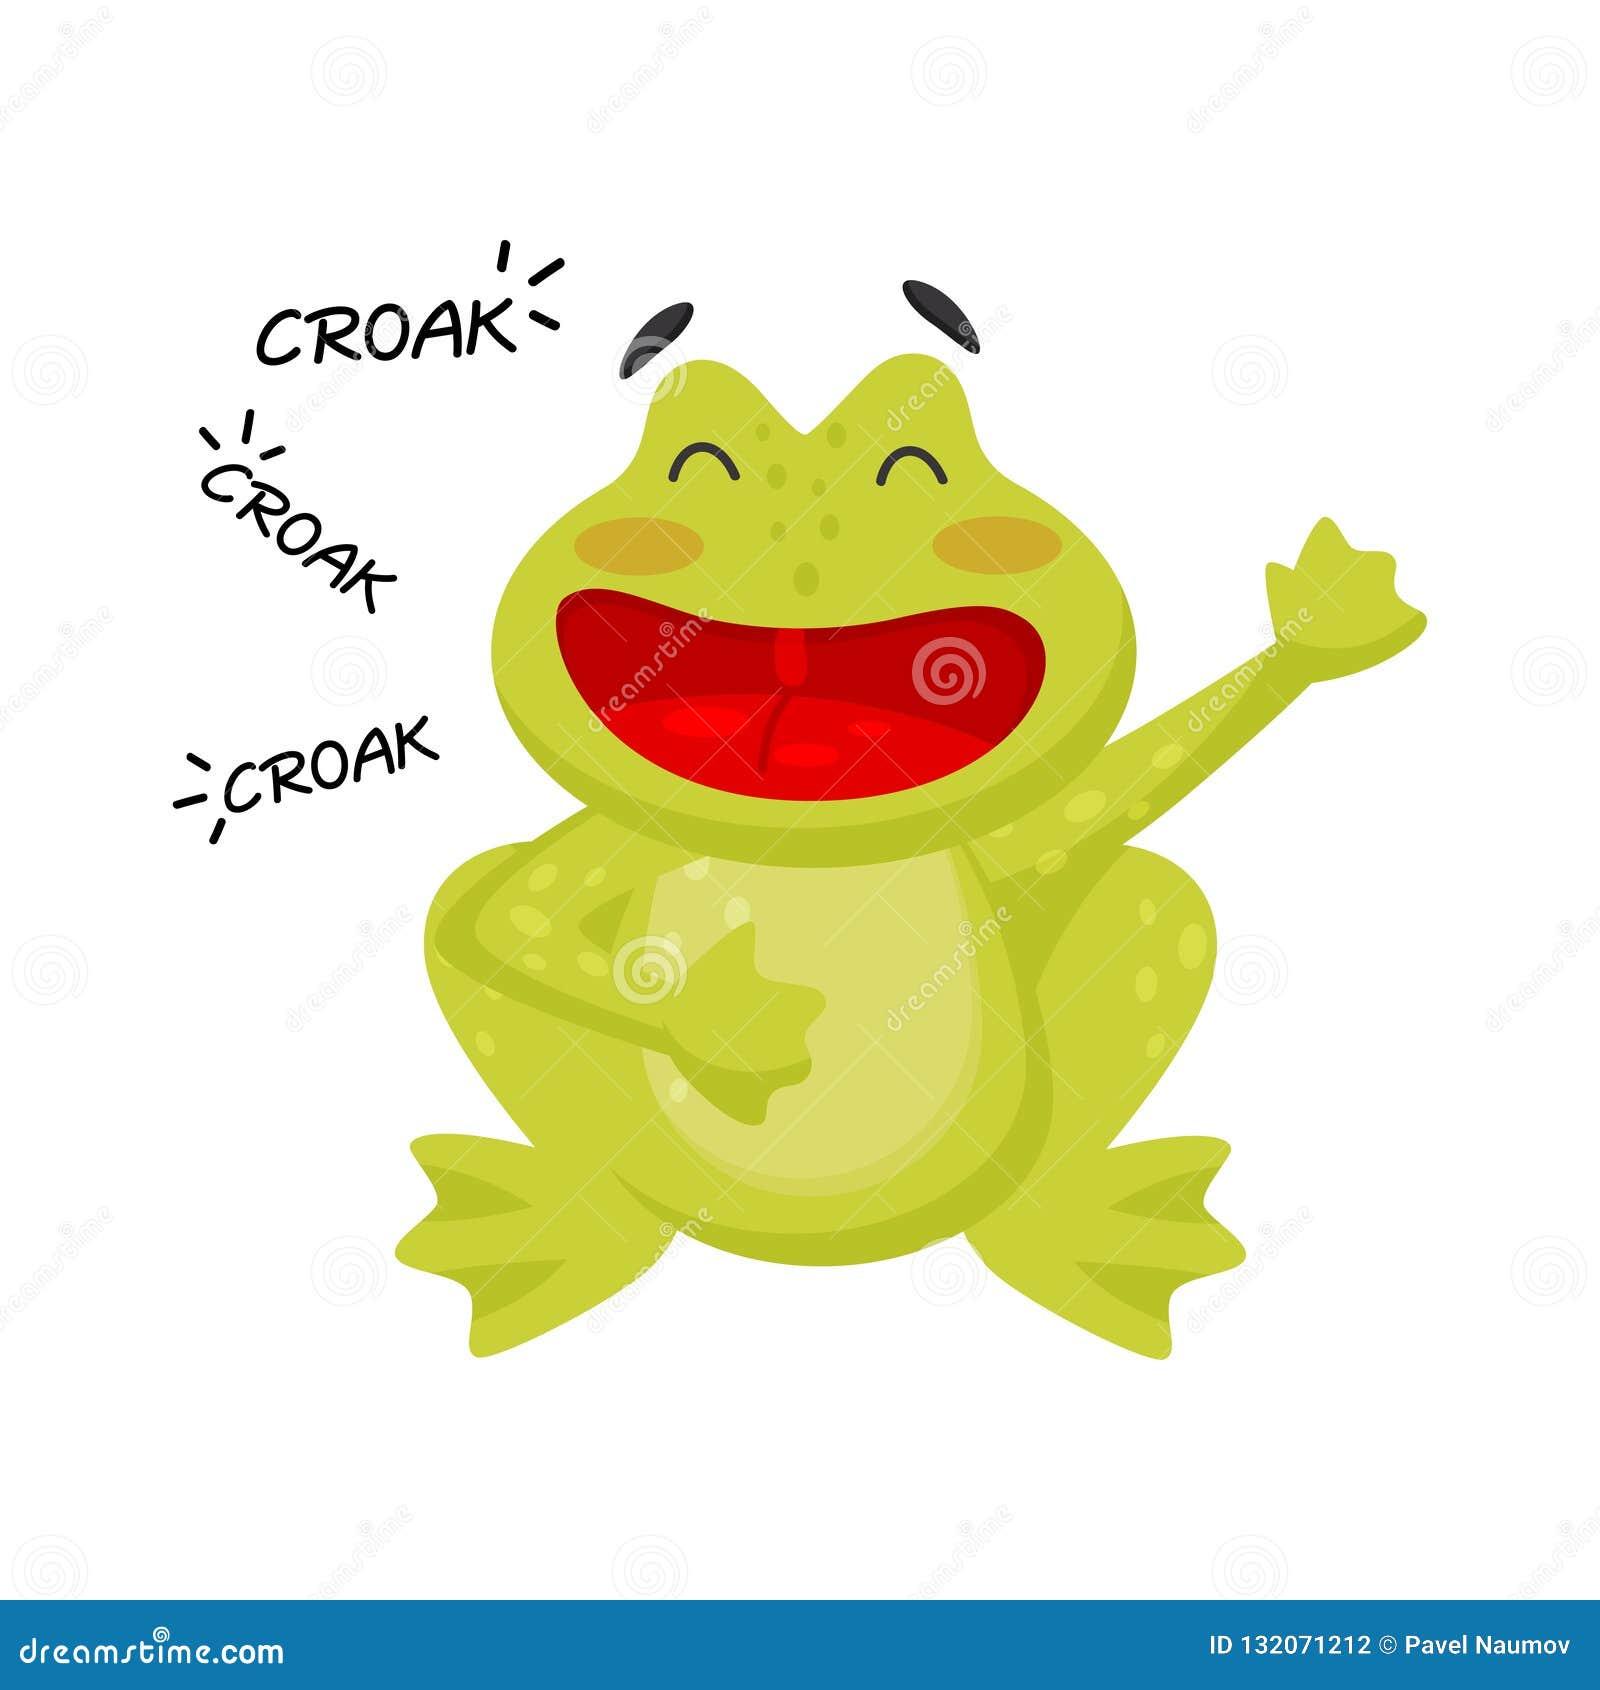 Flat vector icon of cheerful croaking frog. Funny green toad. Cartoon character of amphibian animal